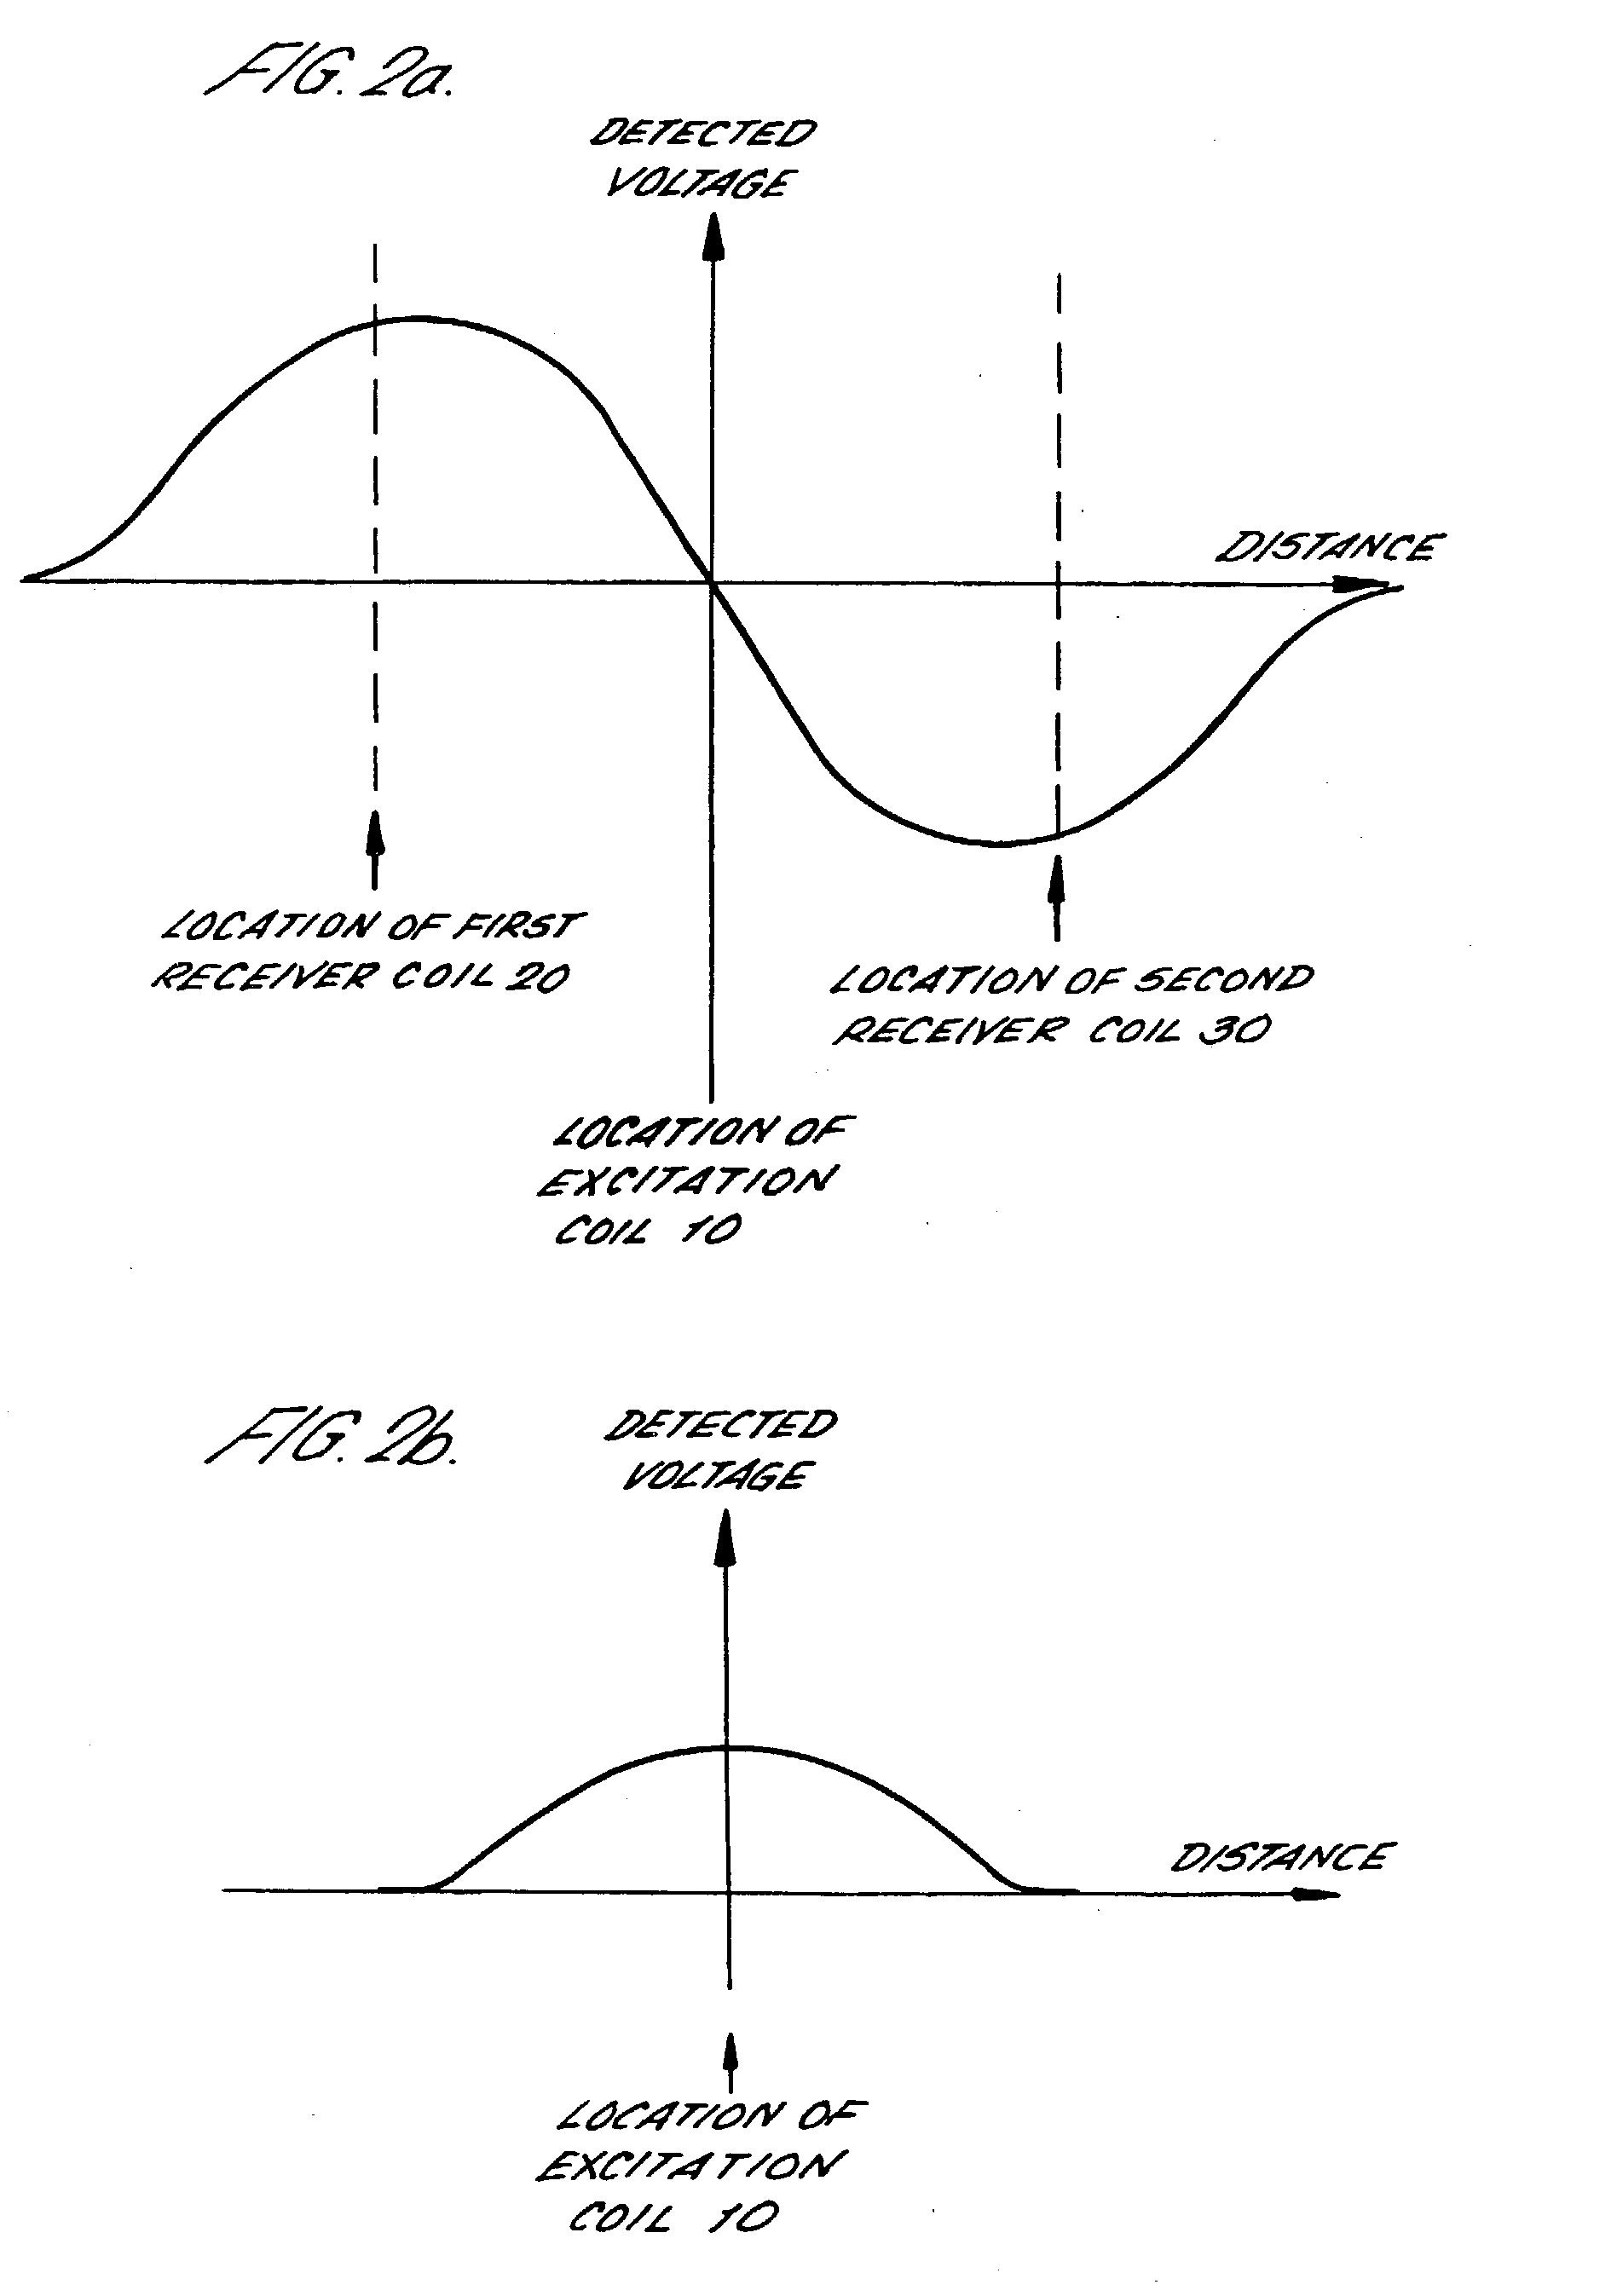 Safeline Metal Detector Wiring Diagram Excellent Electrical Patent Us20030164766 Google Patents Rh Com Na Circuit Whites